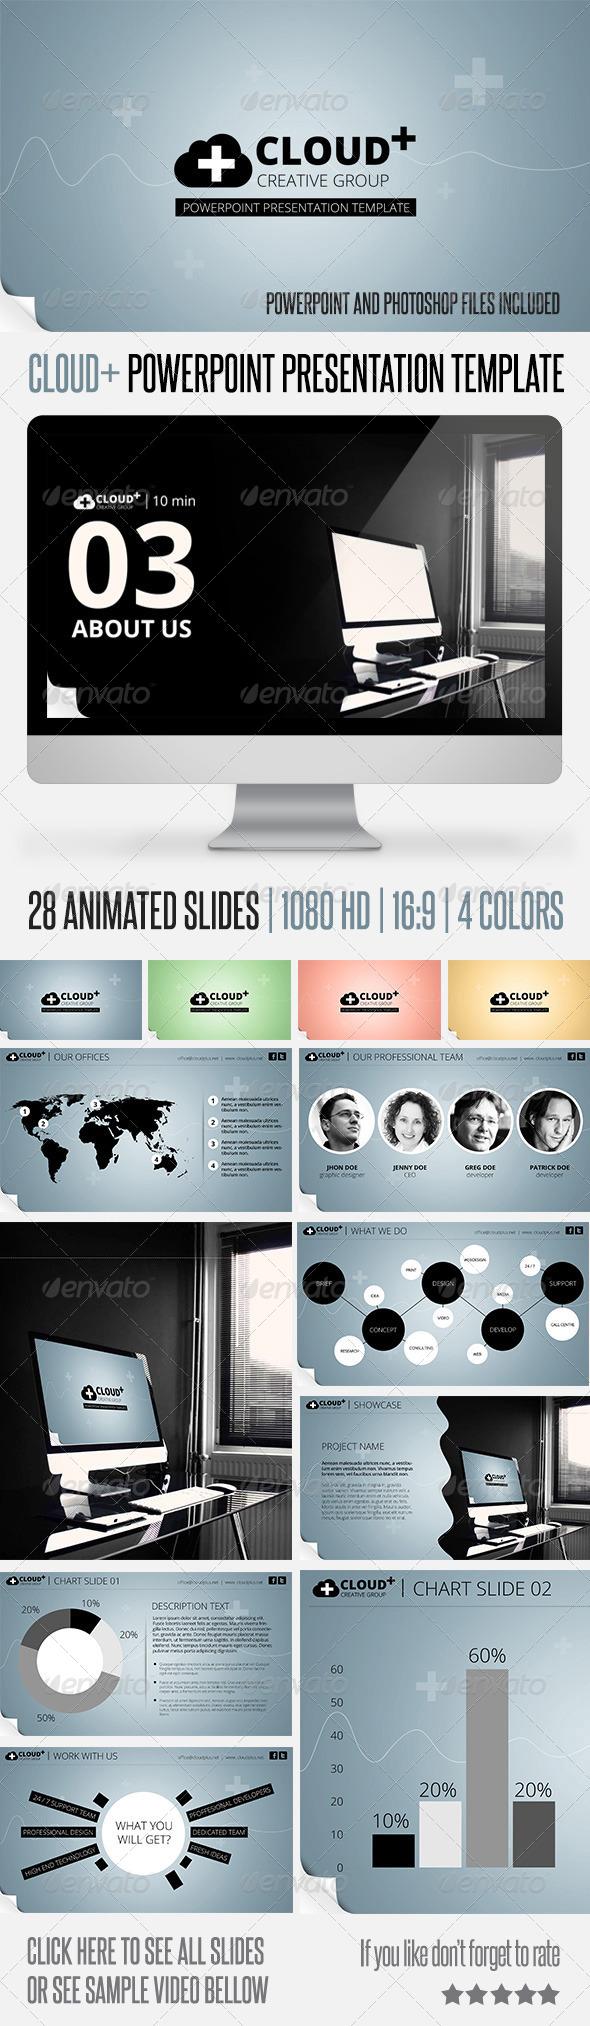 GraphicRiver Cloud Plus Powerpoint Presentation Template 5775968